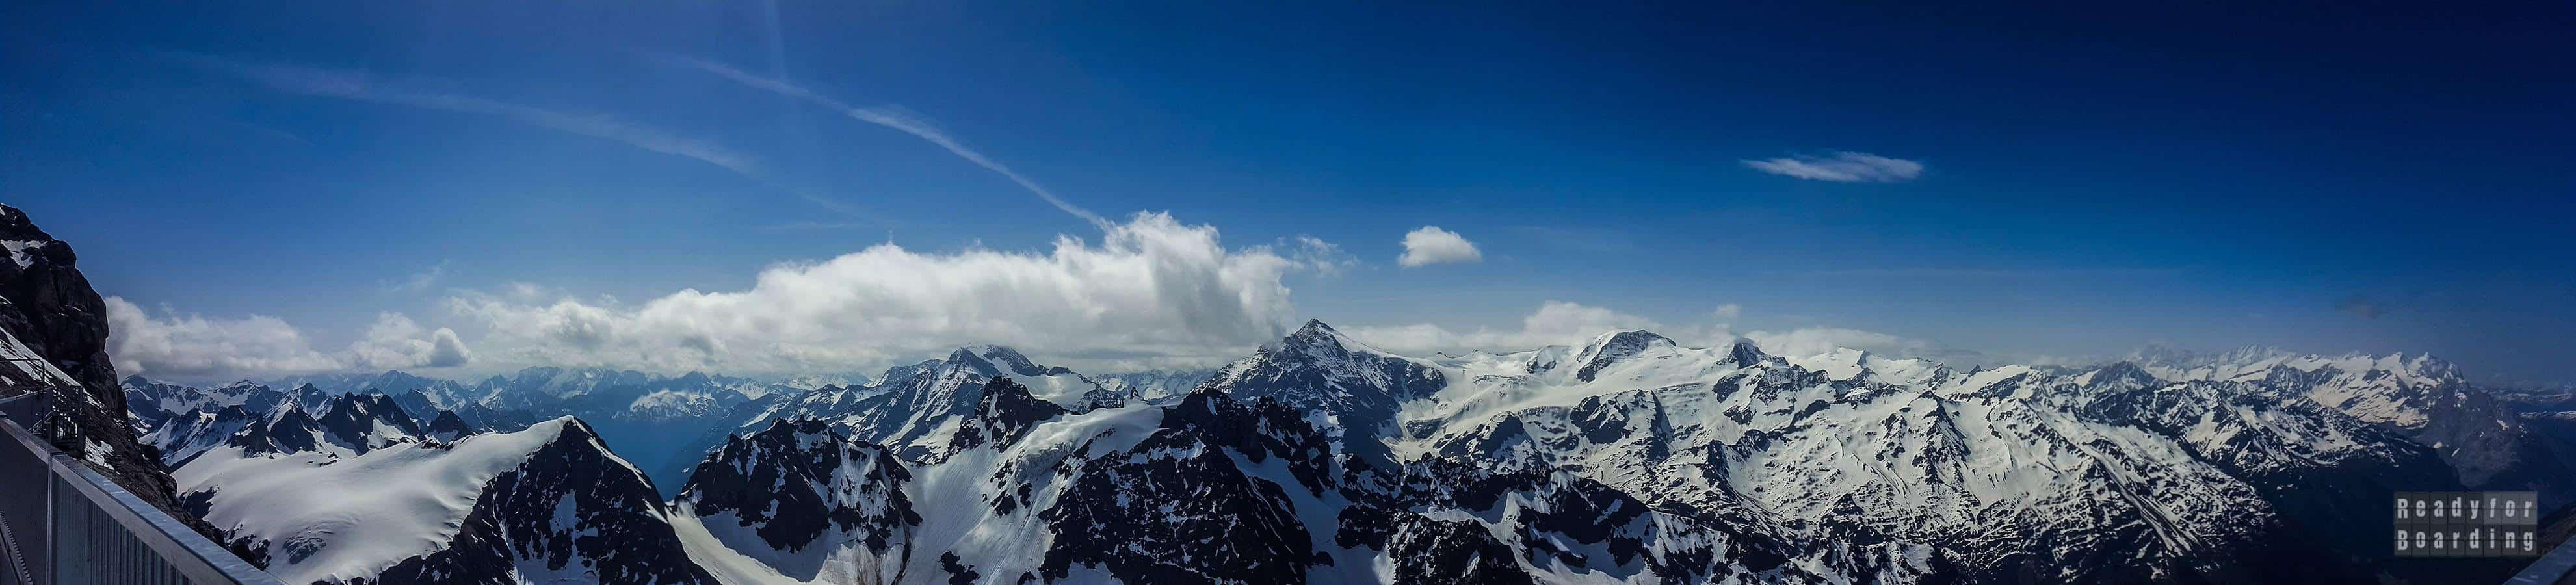 Panorama: Titlis - Szwajcaria